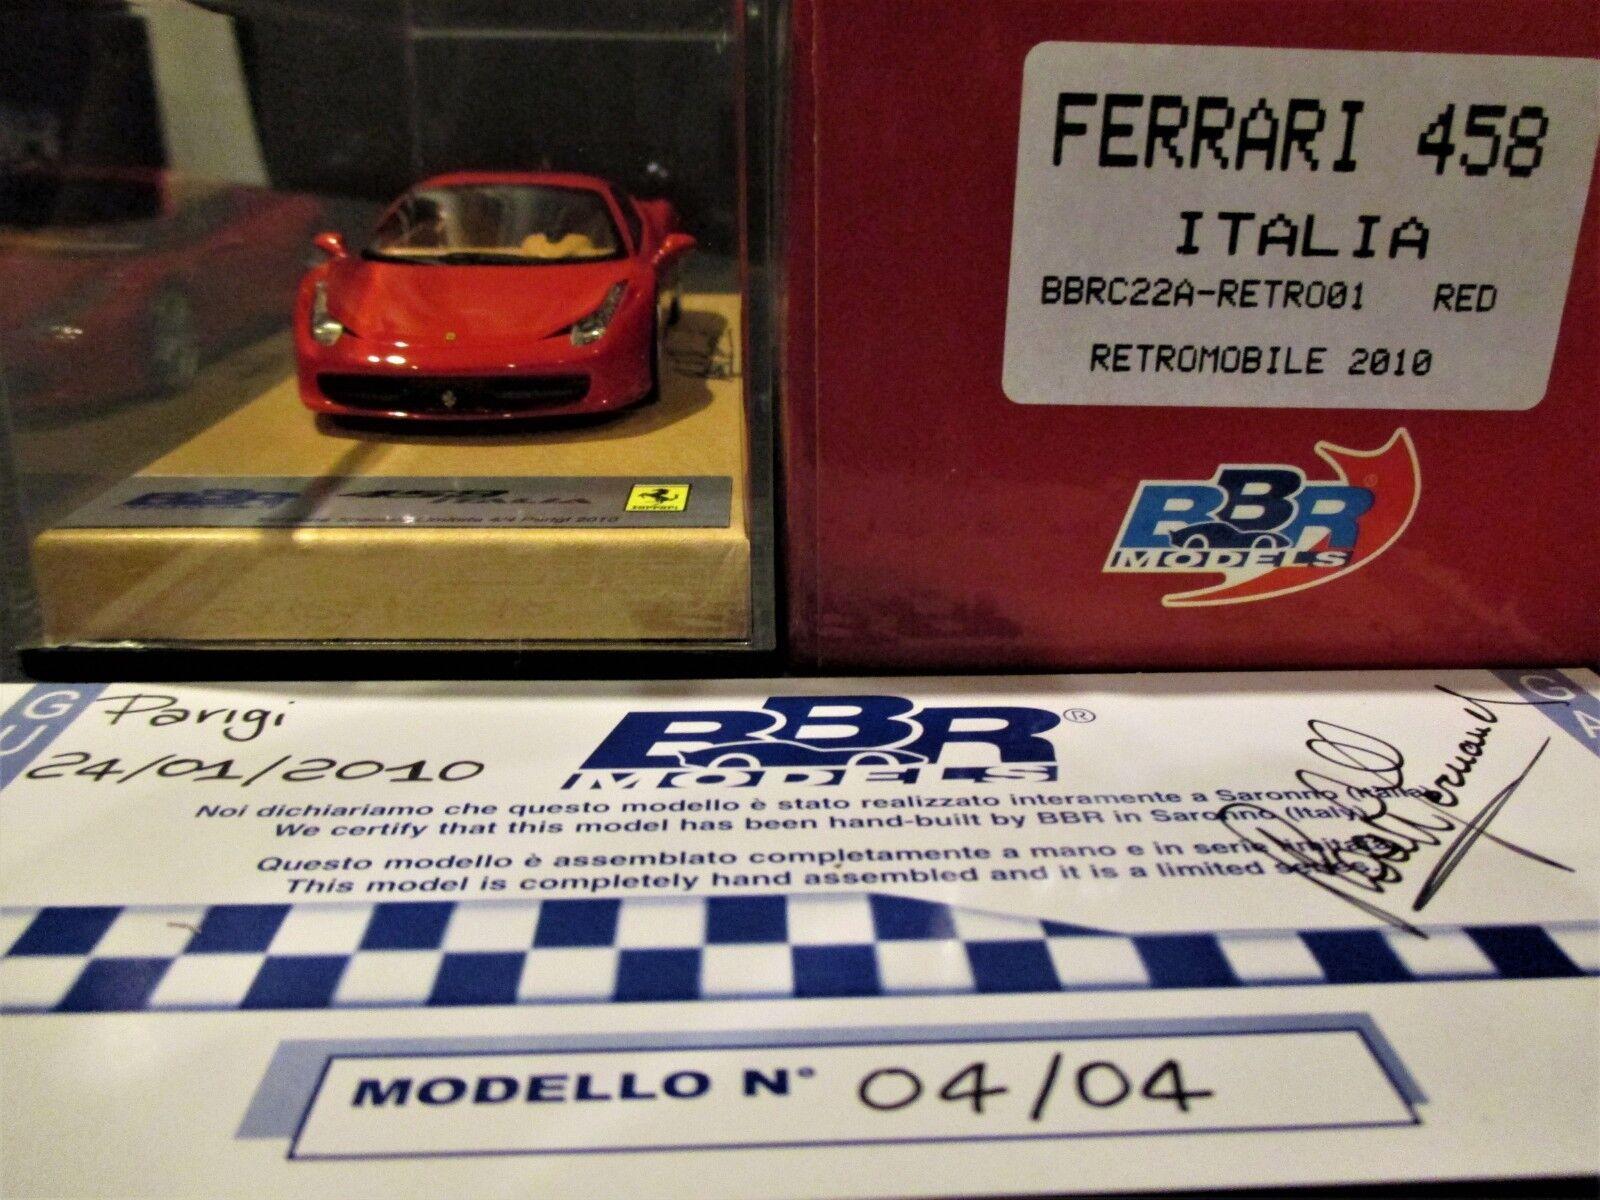 las mejores marcas venden barato FERRARI 458 COUPE rojo CORSA 322 RETROMOBILE BBR 1 1 1 43  BBRC22A-RETRO01 N°04 04  los clientes primero